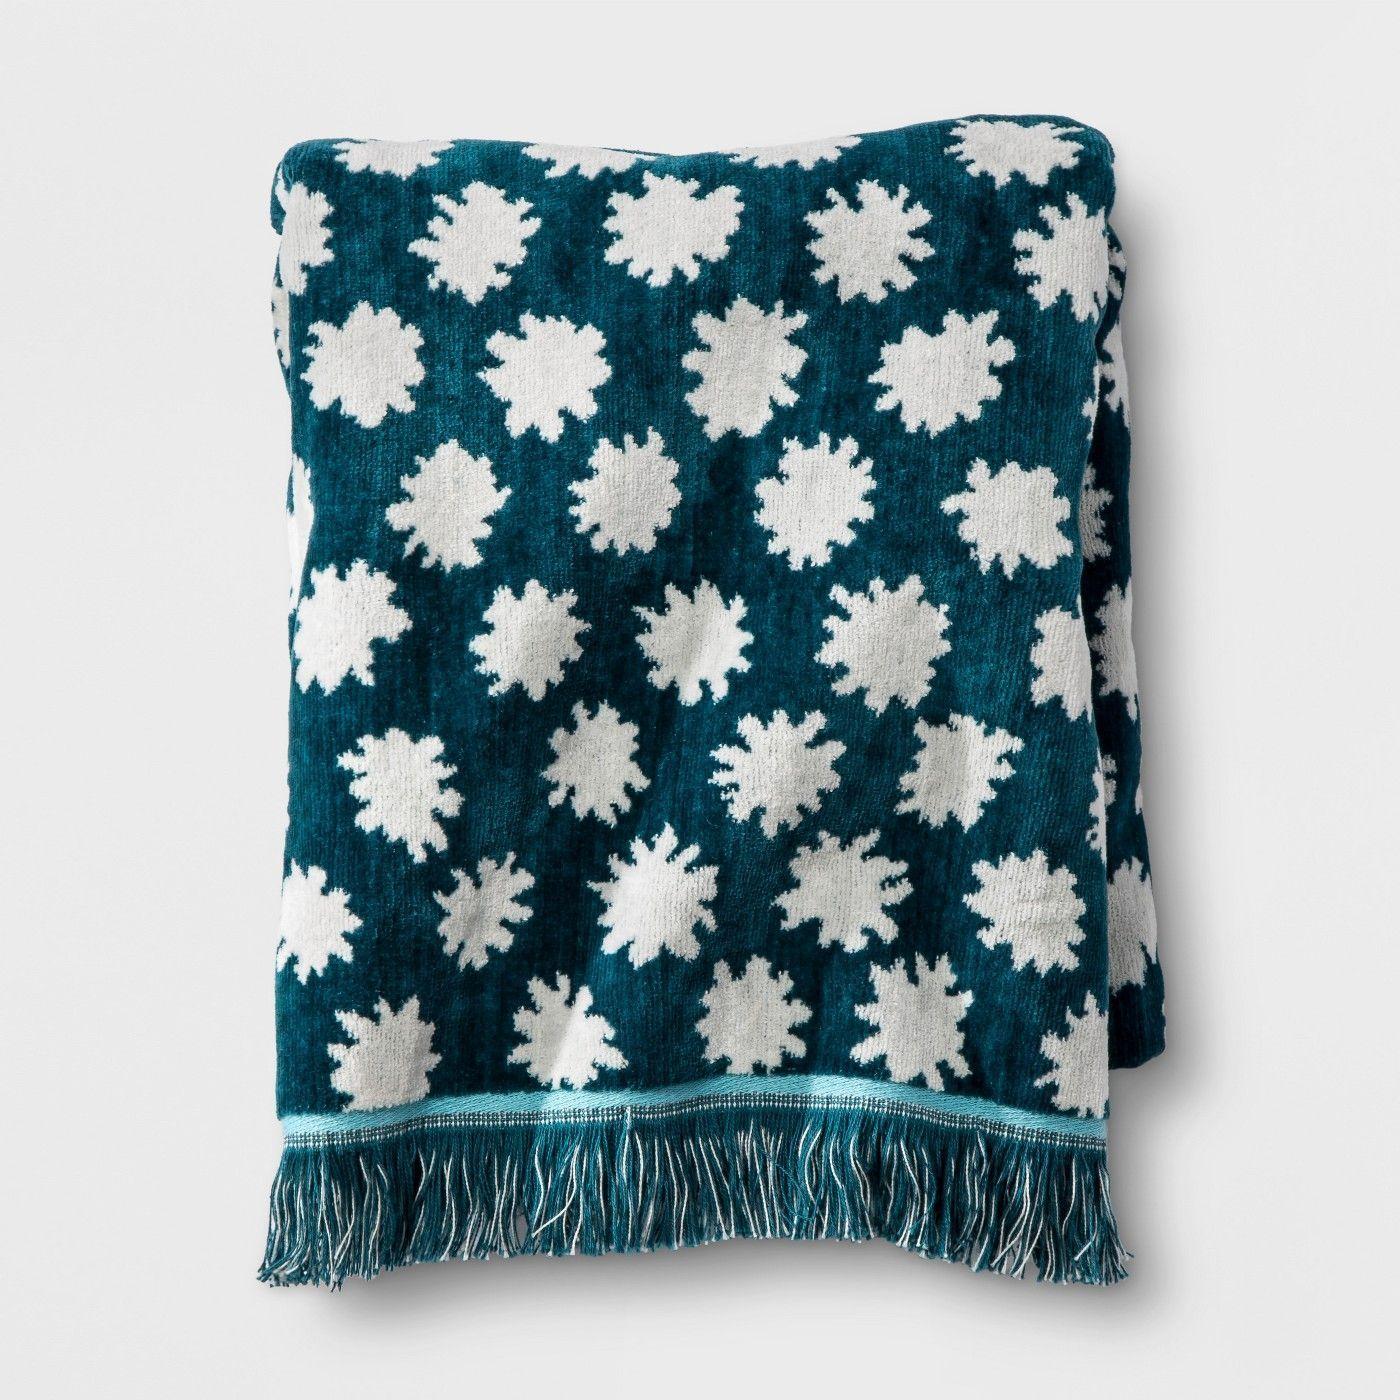 Opalhouse Sheered Floral Fringe Bath Towel Tar Home Home decor